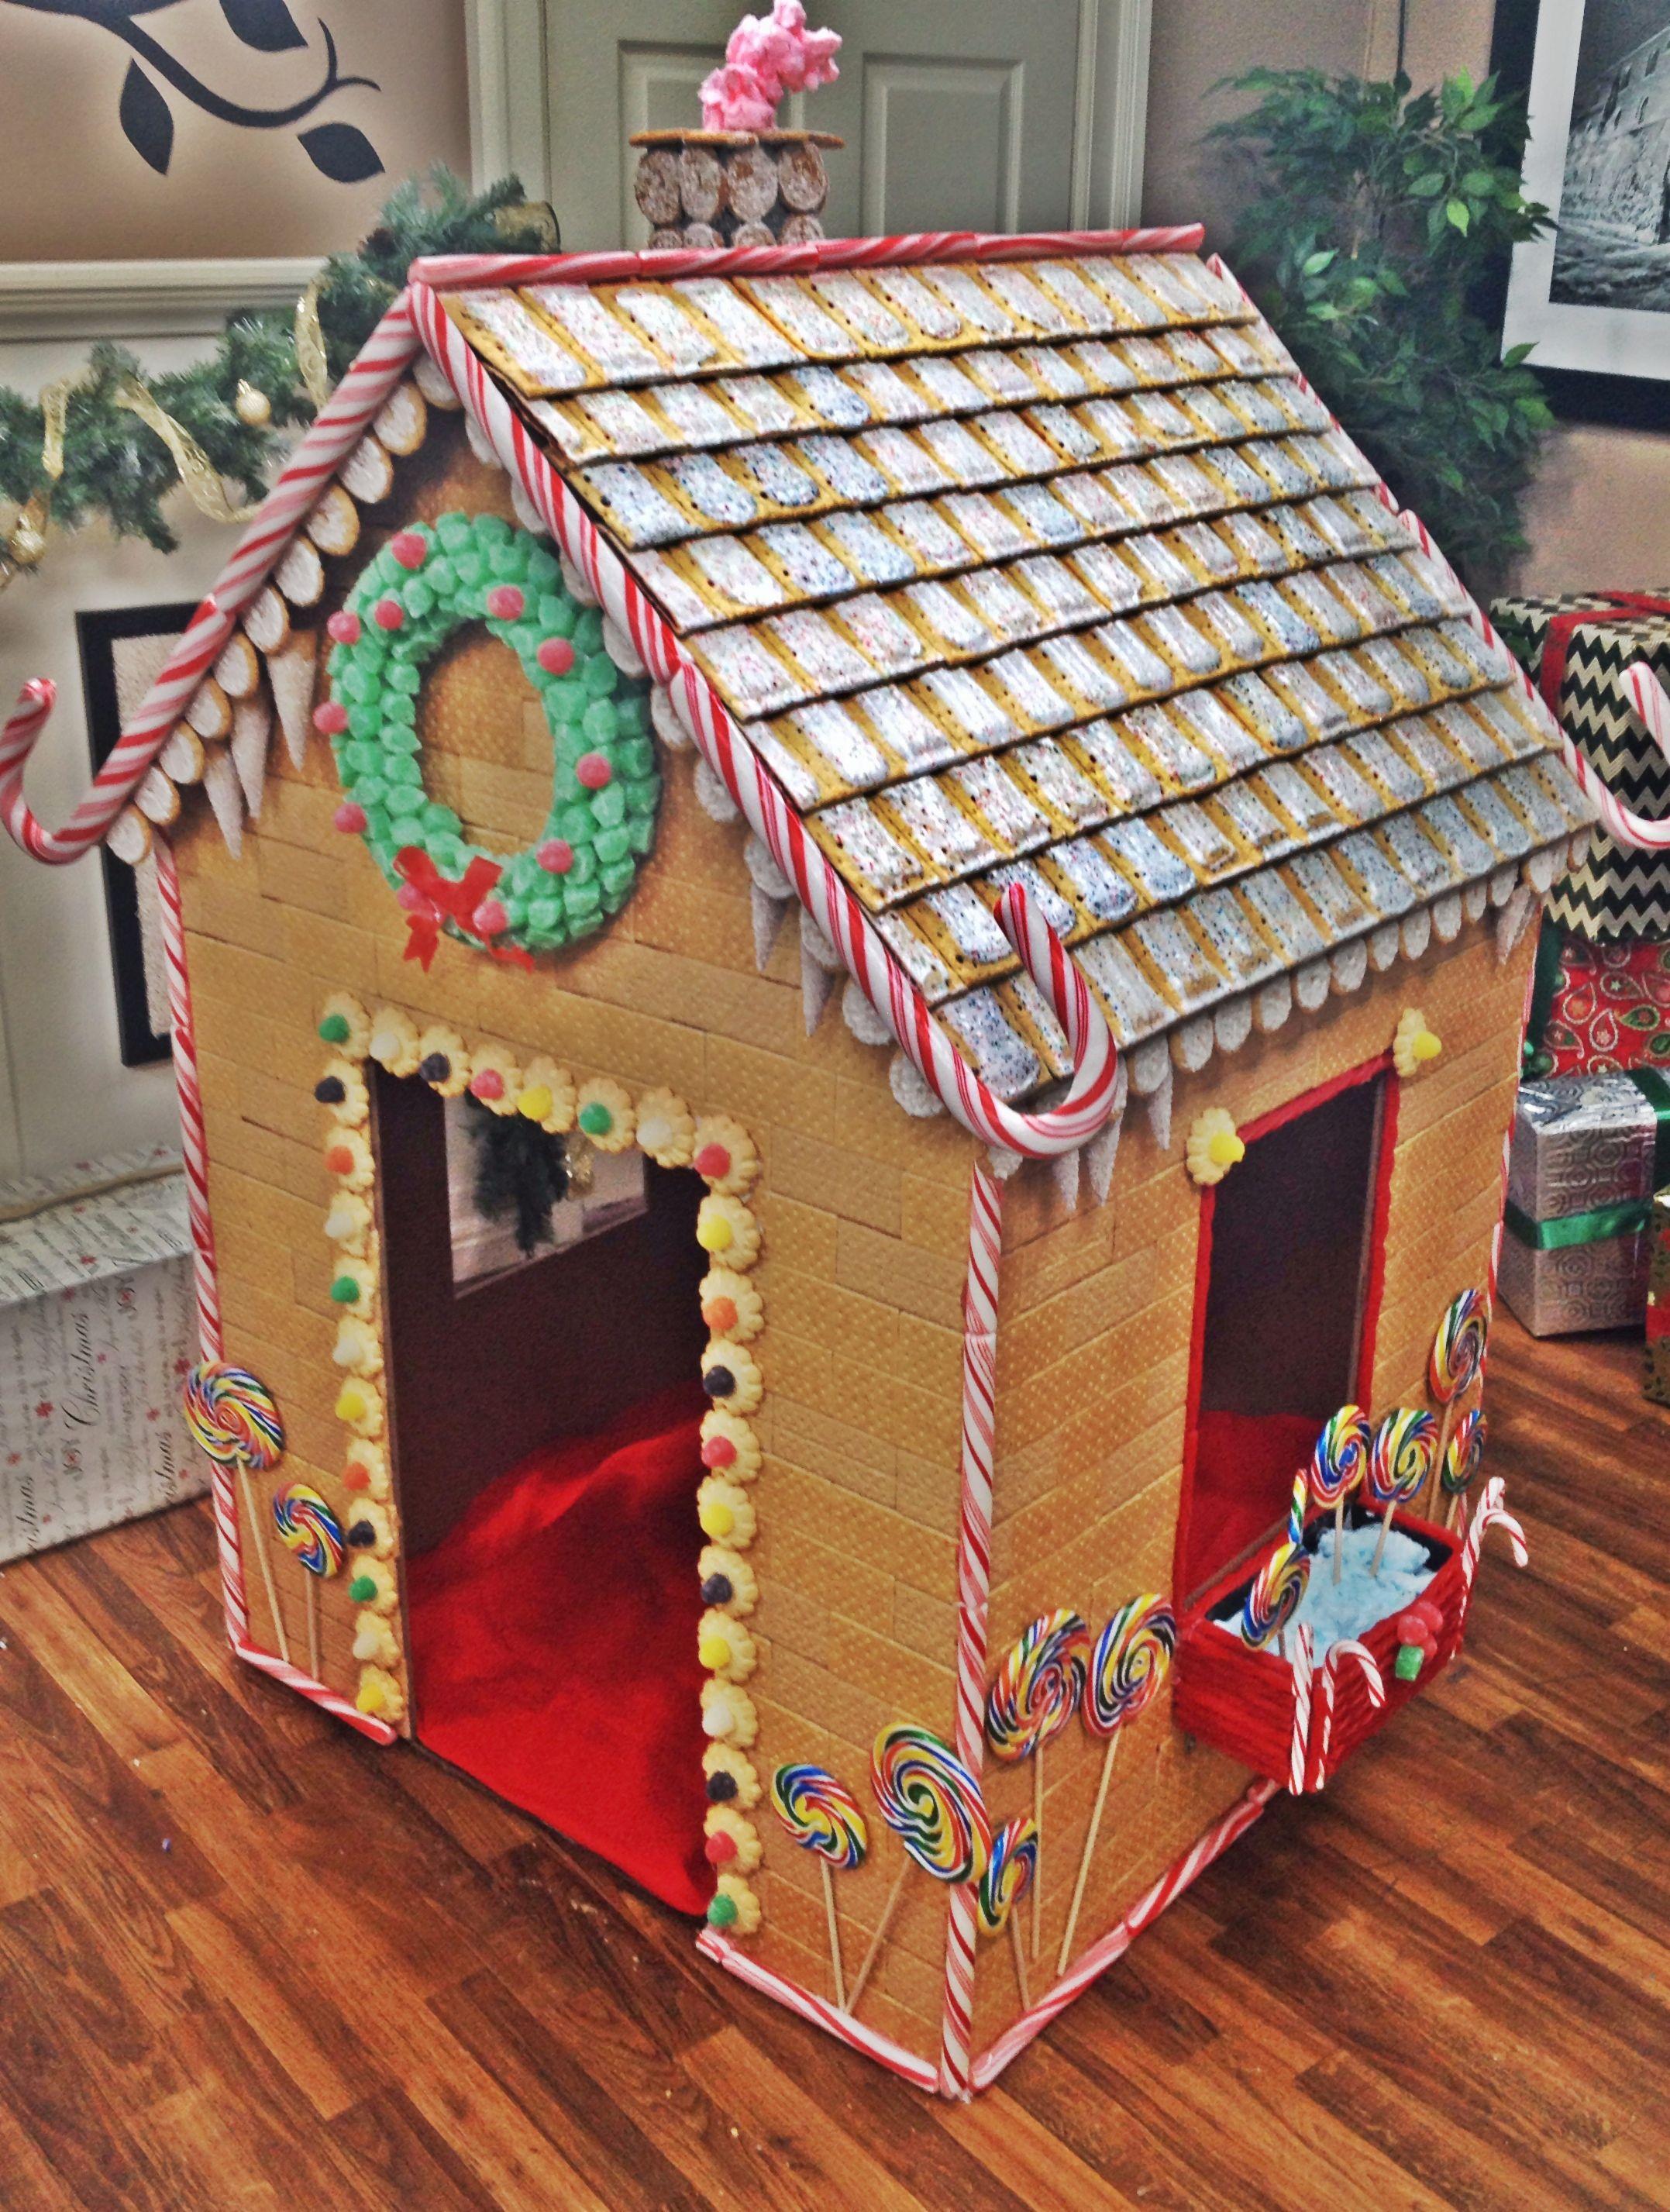 Gingerbread Playhouse Diy For Hansel Amp Gretel Cute Dyi